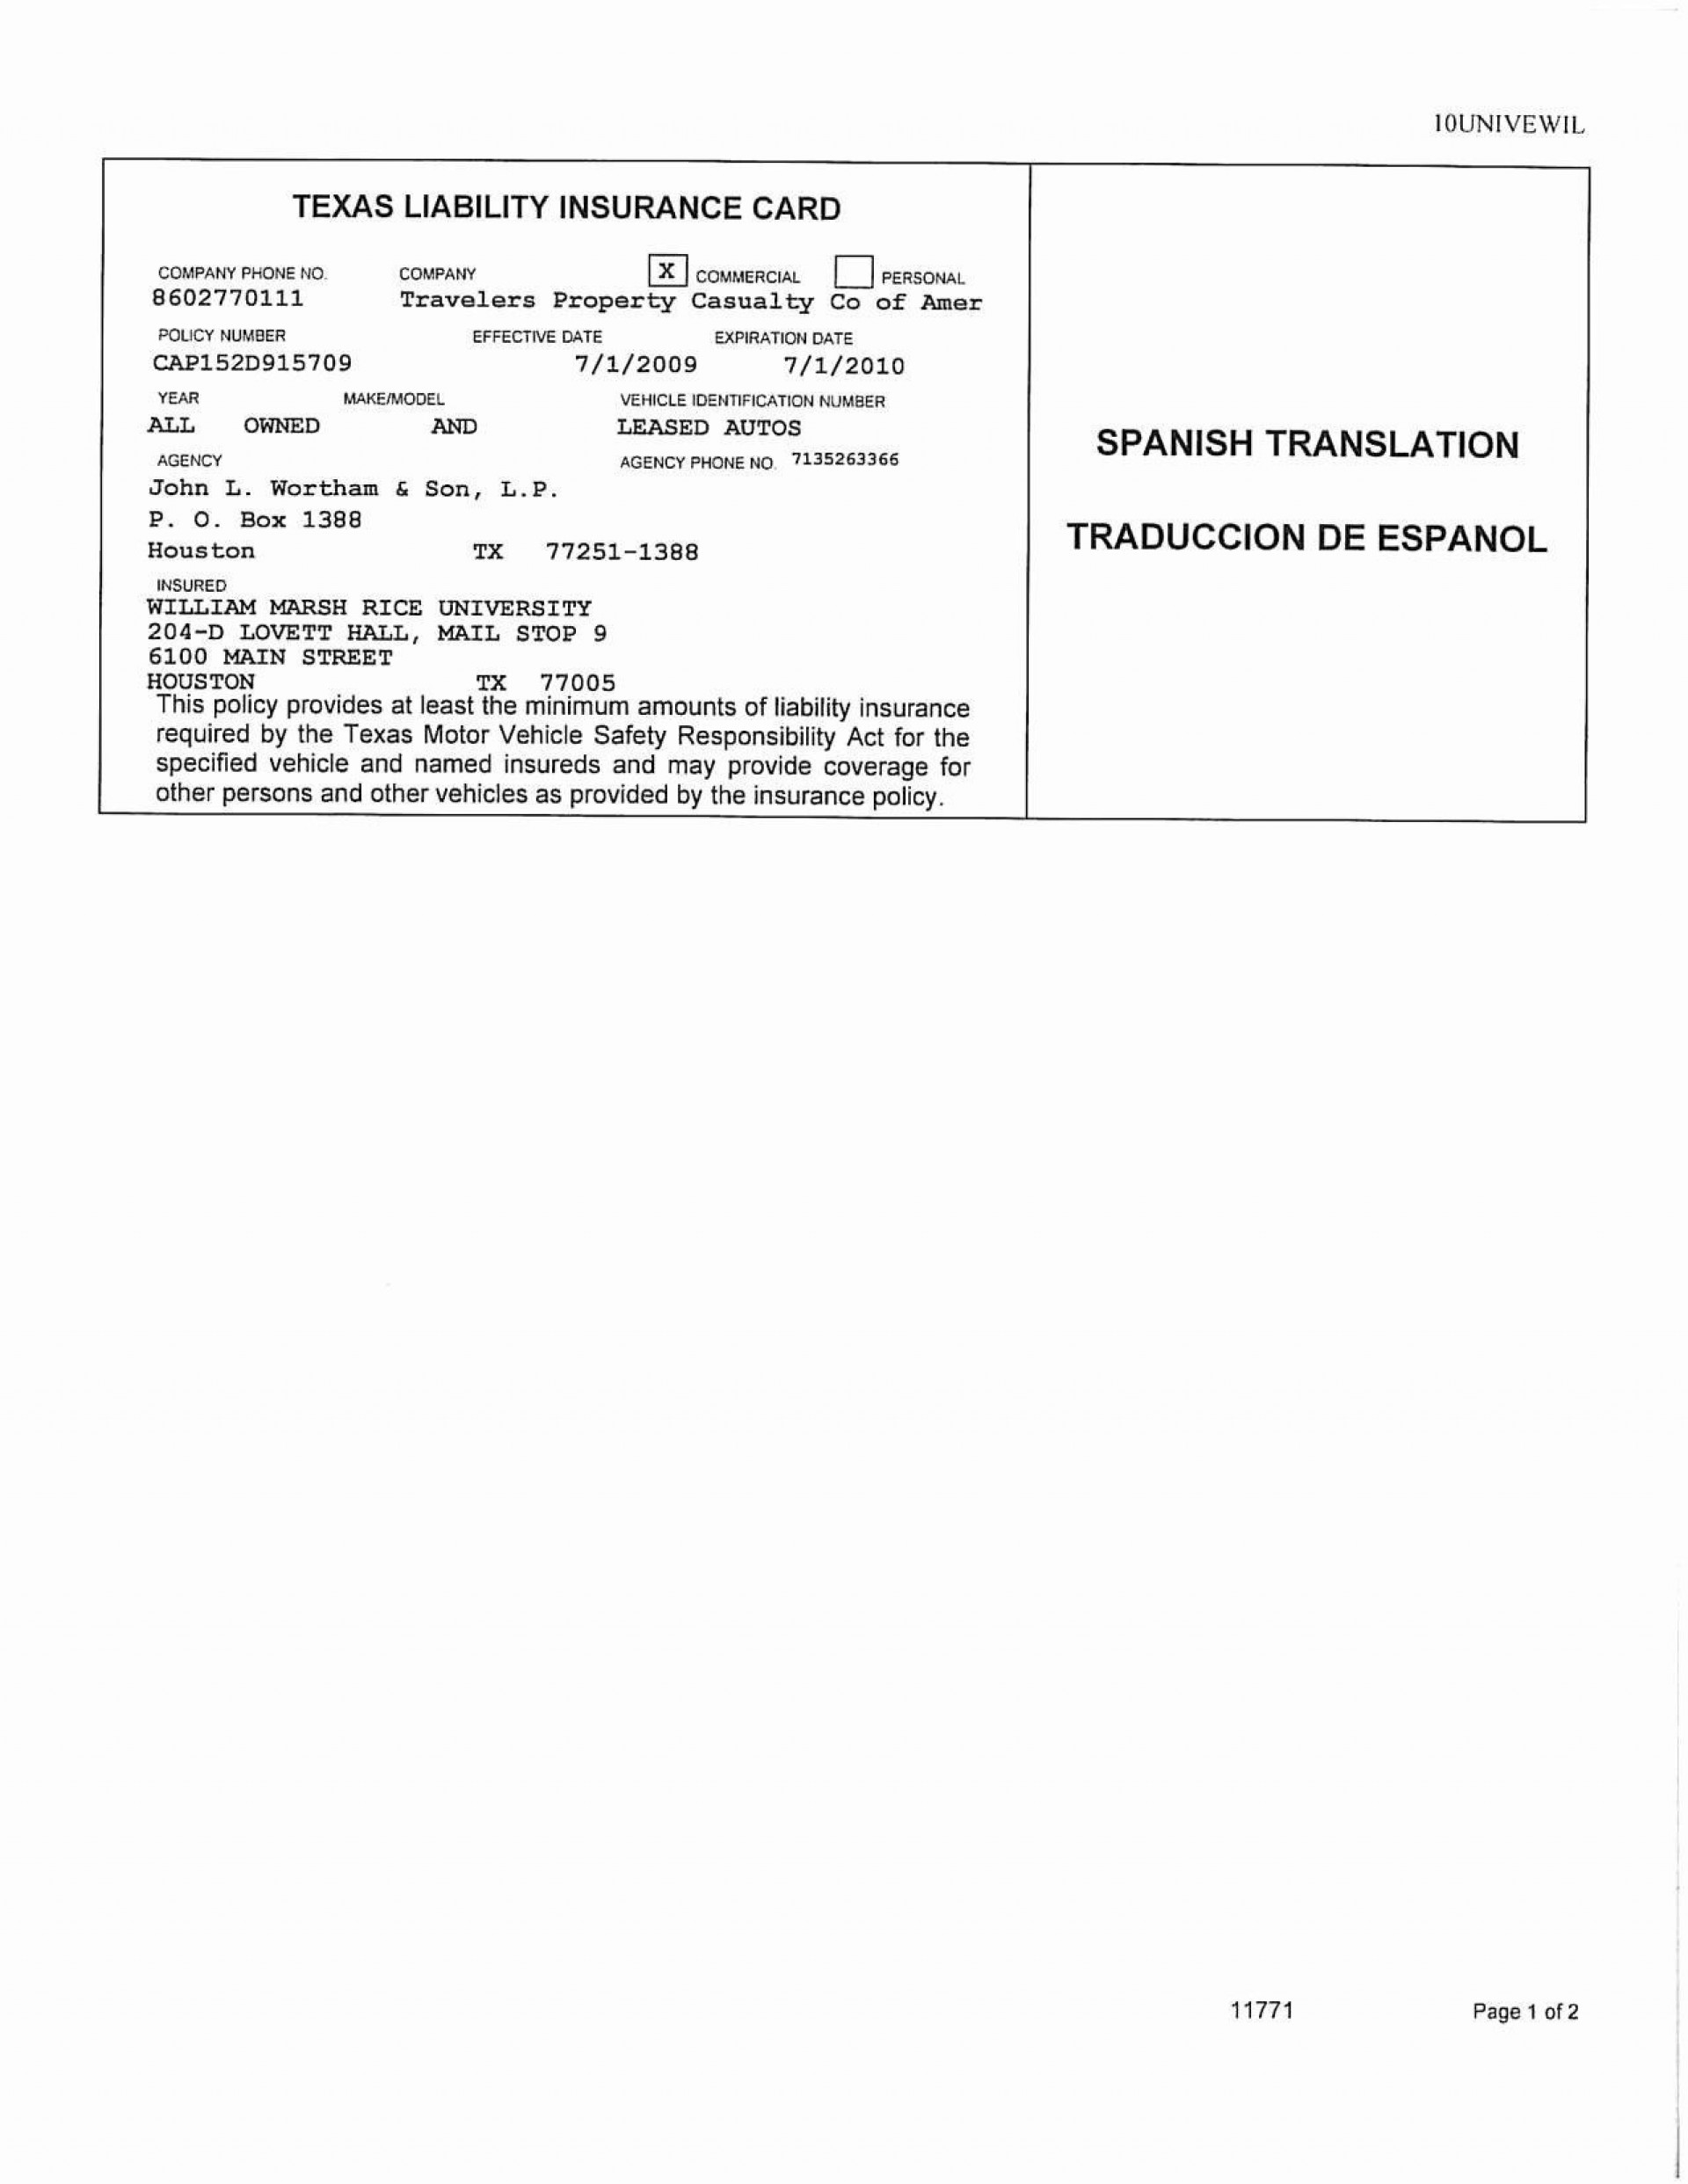 001 Simple Auto Insurance Card Template Pdf High Resolution  Car Fake Geico Filler1920